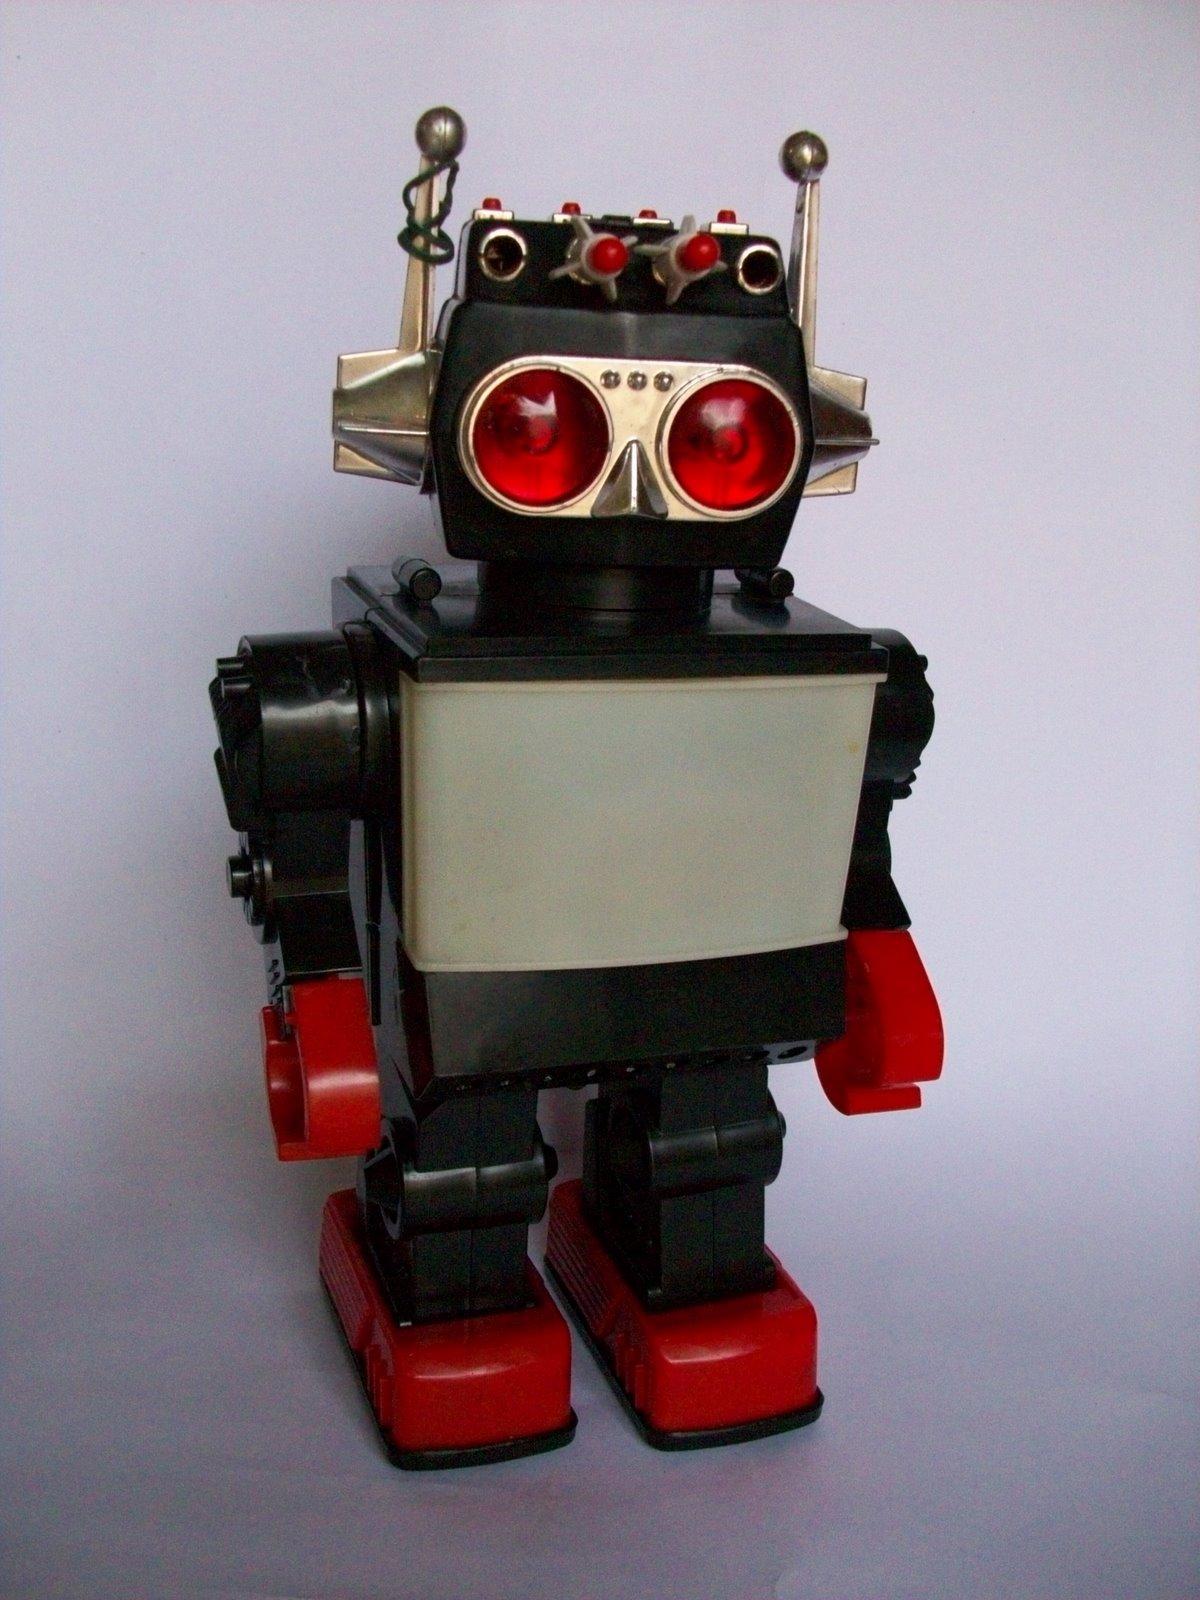 Vintage Toy Robots : Serba vintage robot saturn